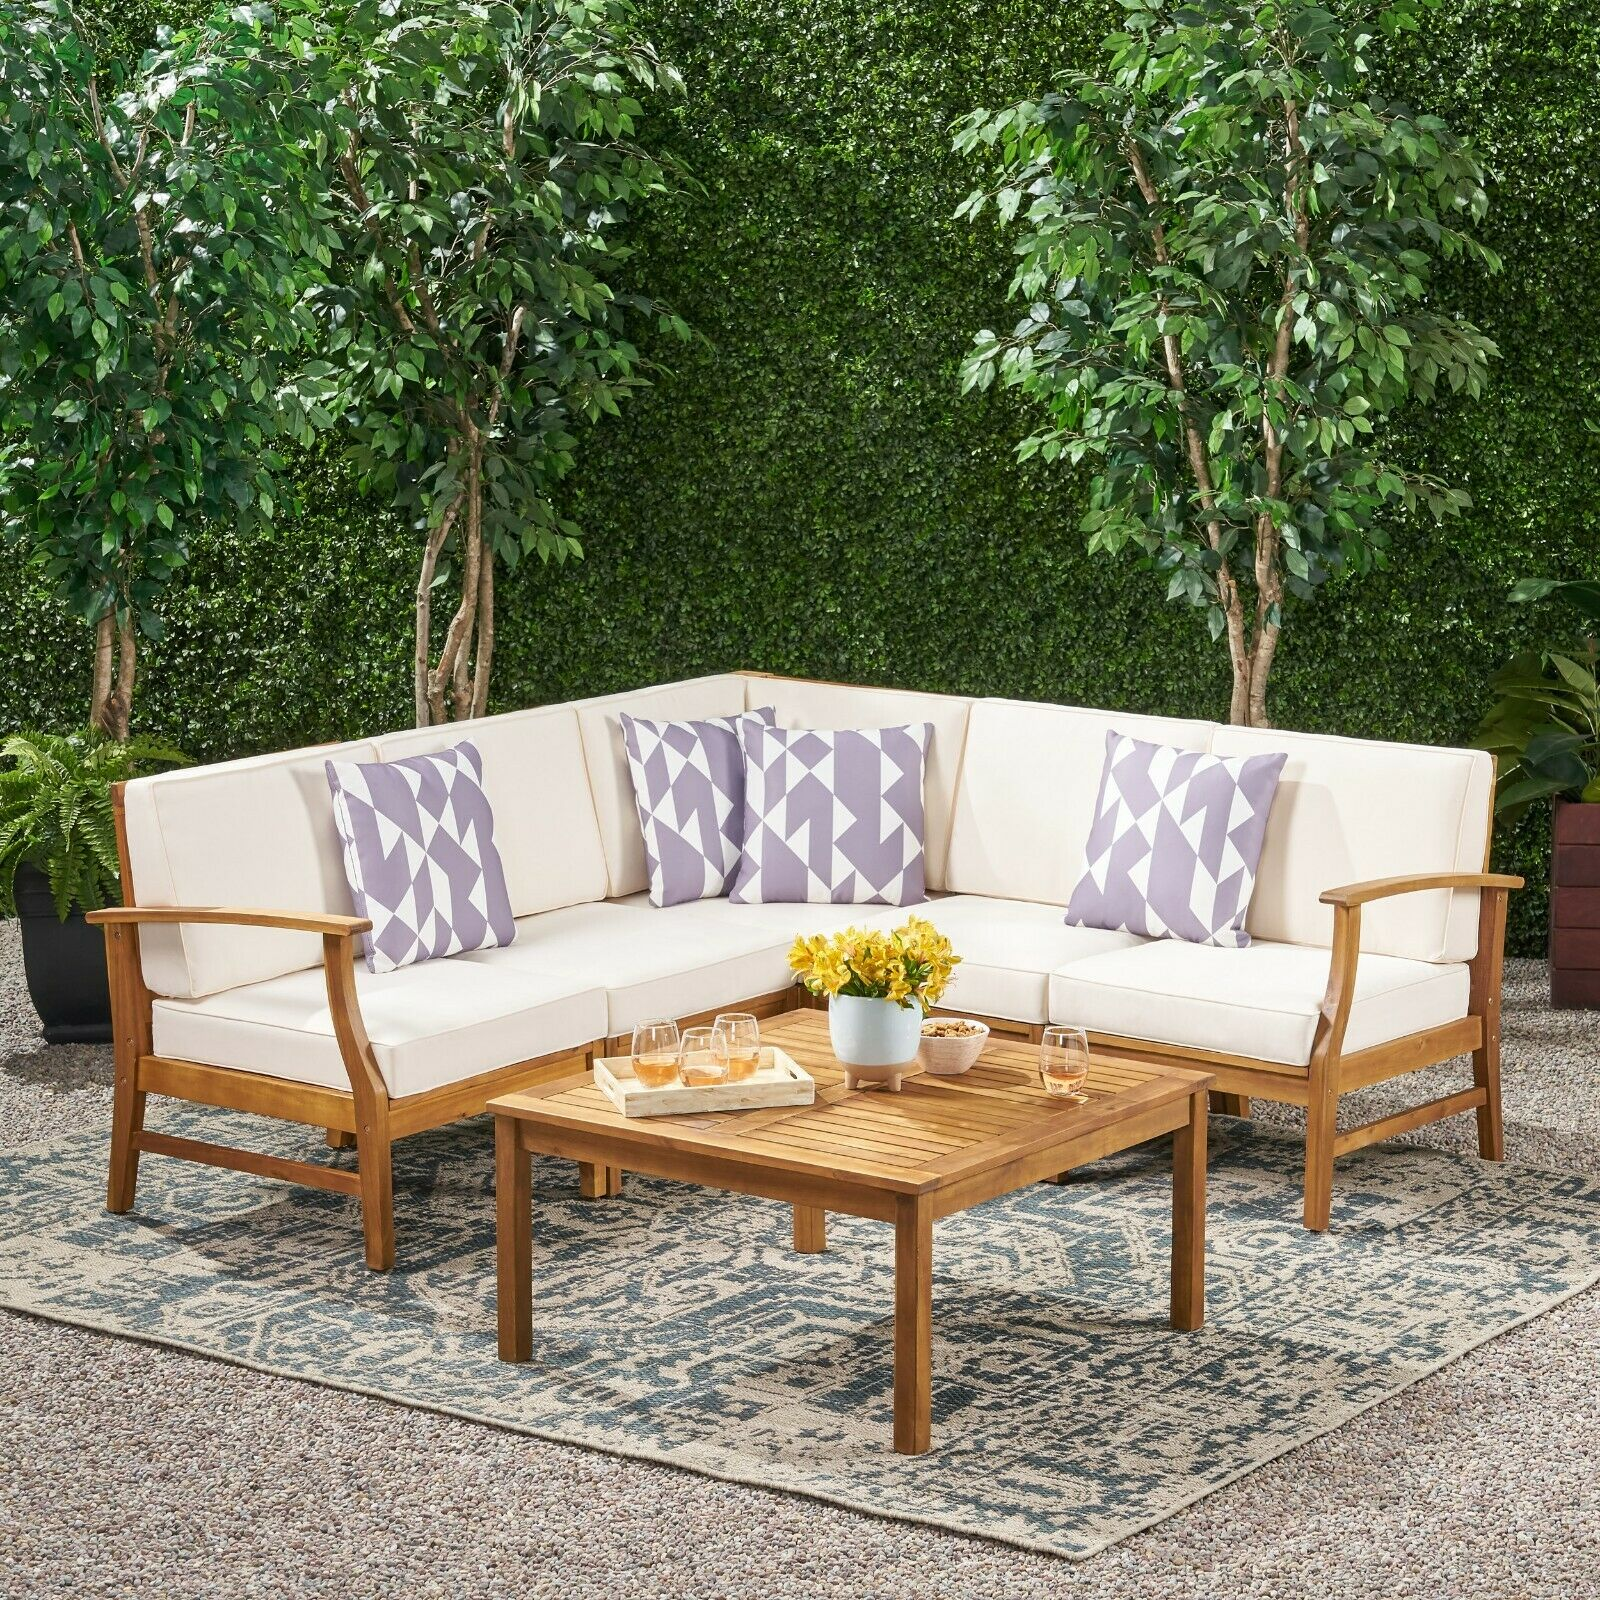 Capri Modern Outdoor Teak Acacia Wood Sectional Sofa Set with Cushions Home & Garden